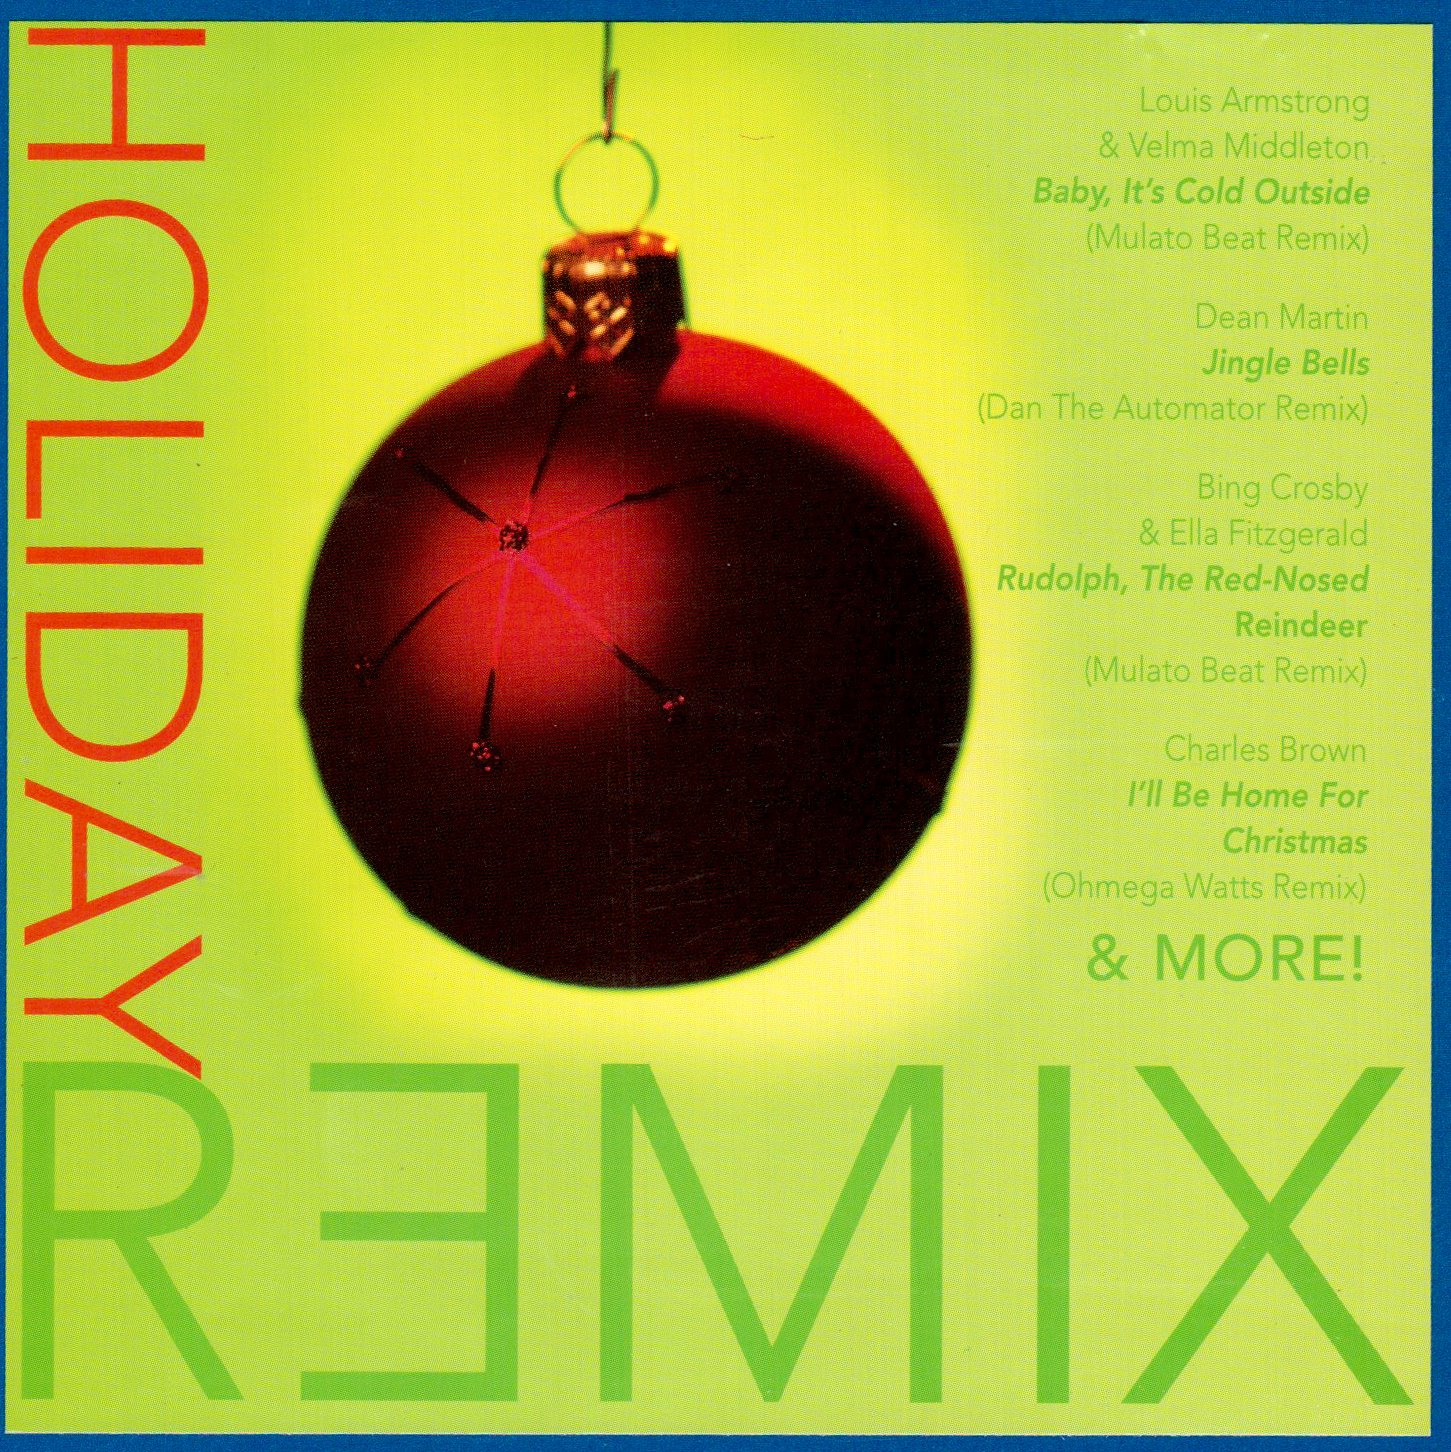 Holiday Remix CD